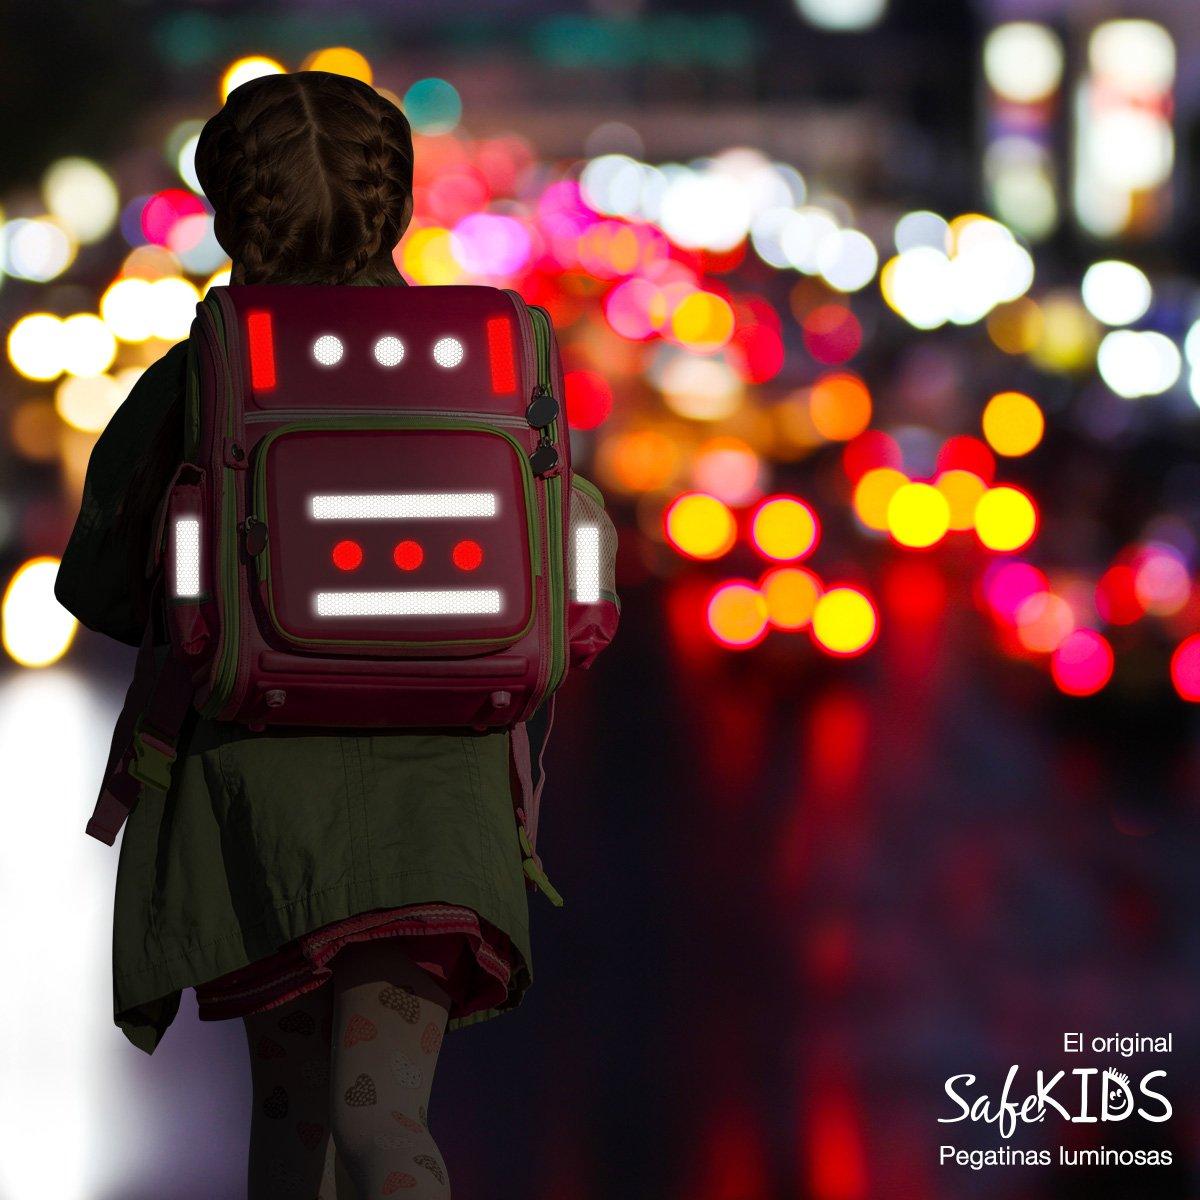 Pegatinas luminosas SafeKIDS, AMARILLO, 13 unidades para ...